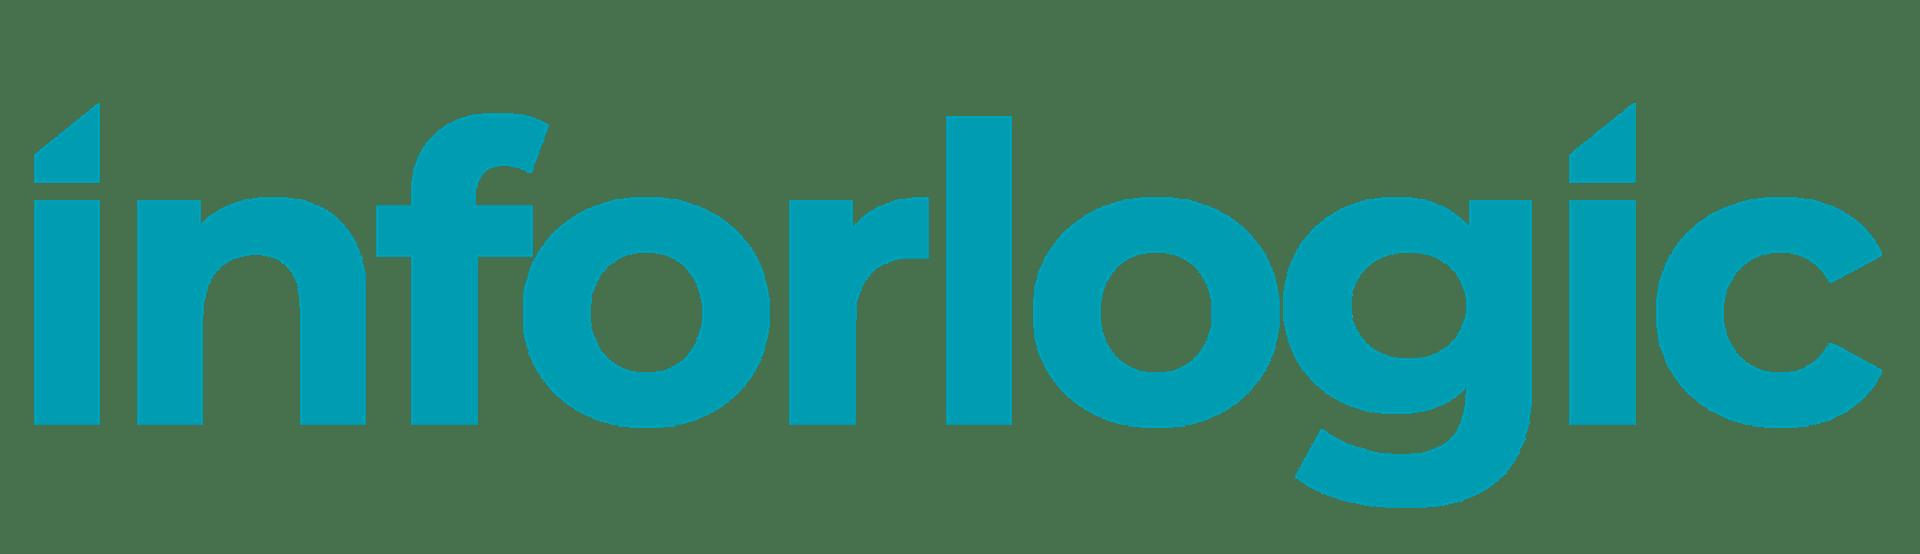 Inforlogic company logo